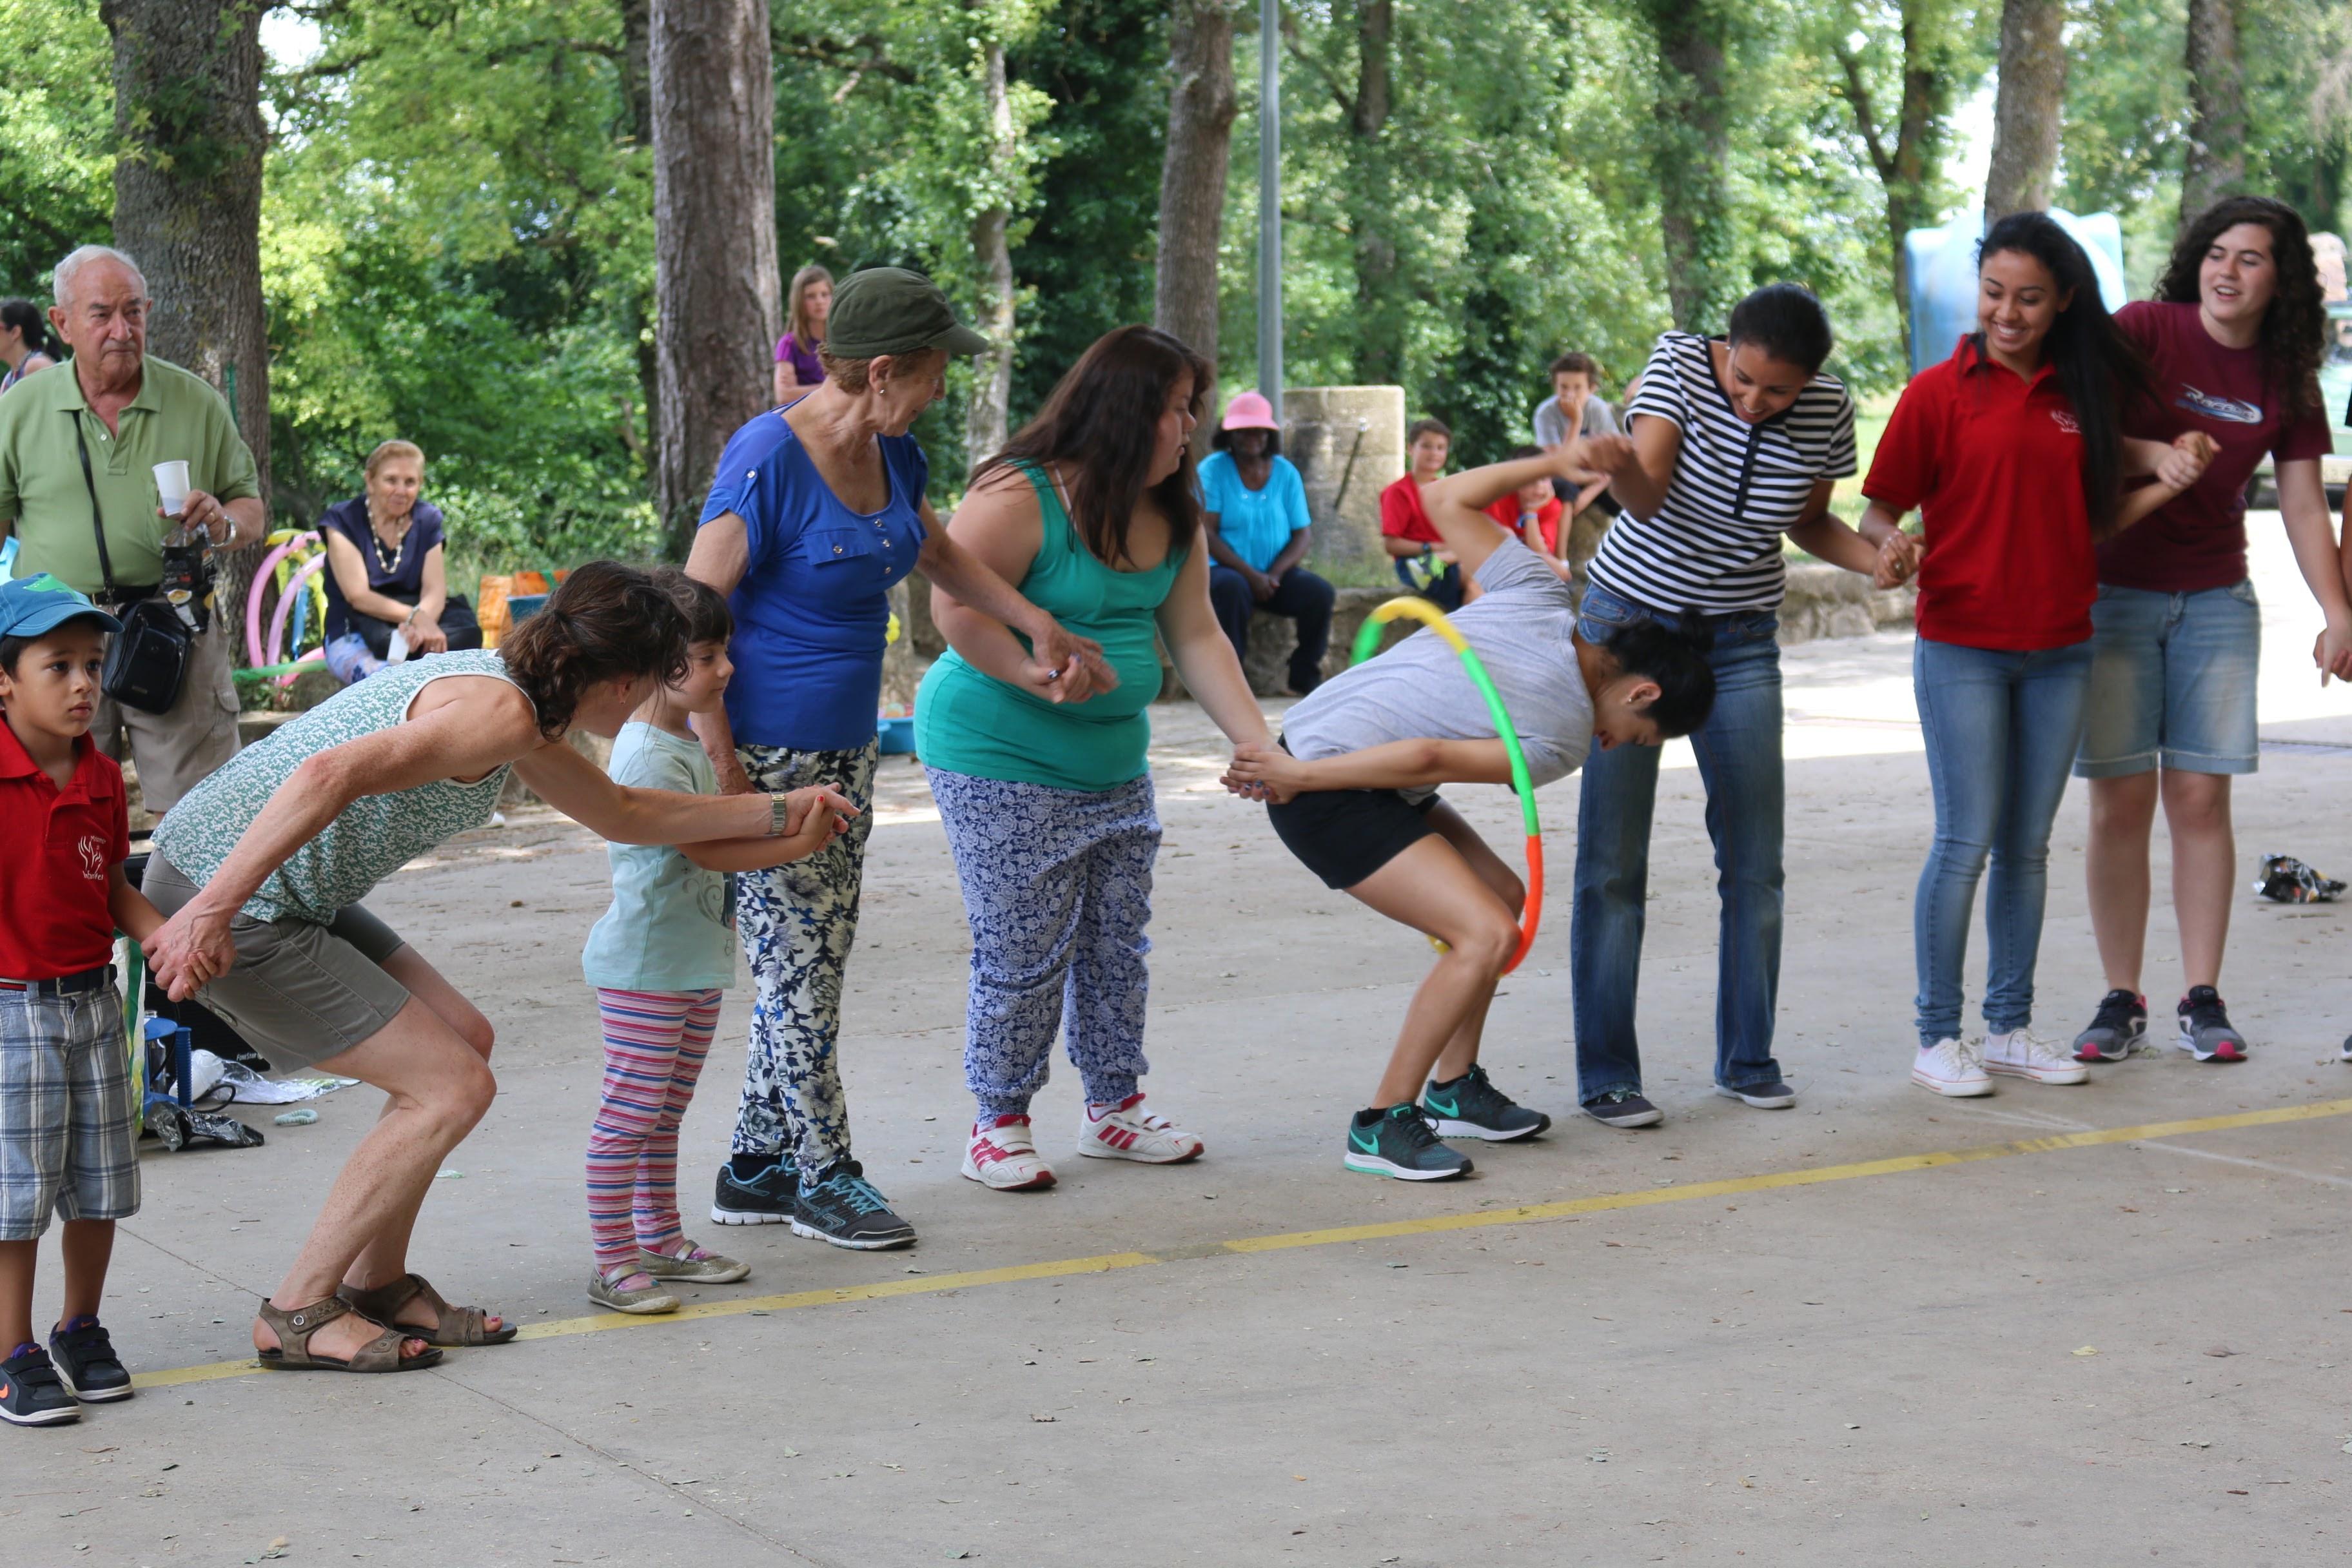 Picasa - Día de Campo SdJ 05.07.2015 (35).jpg